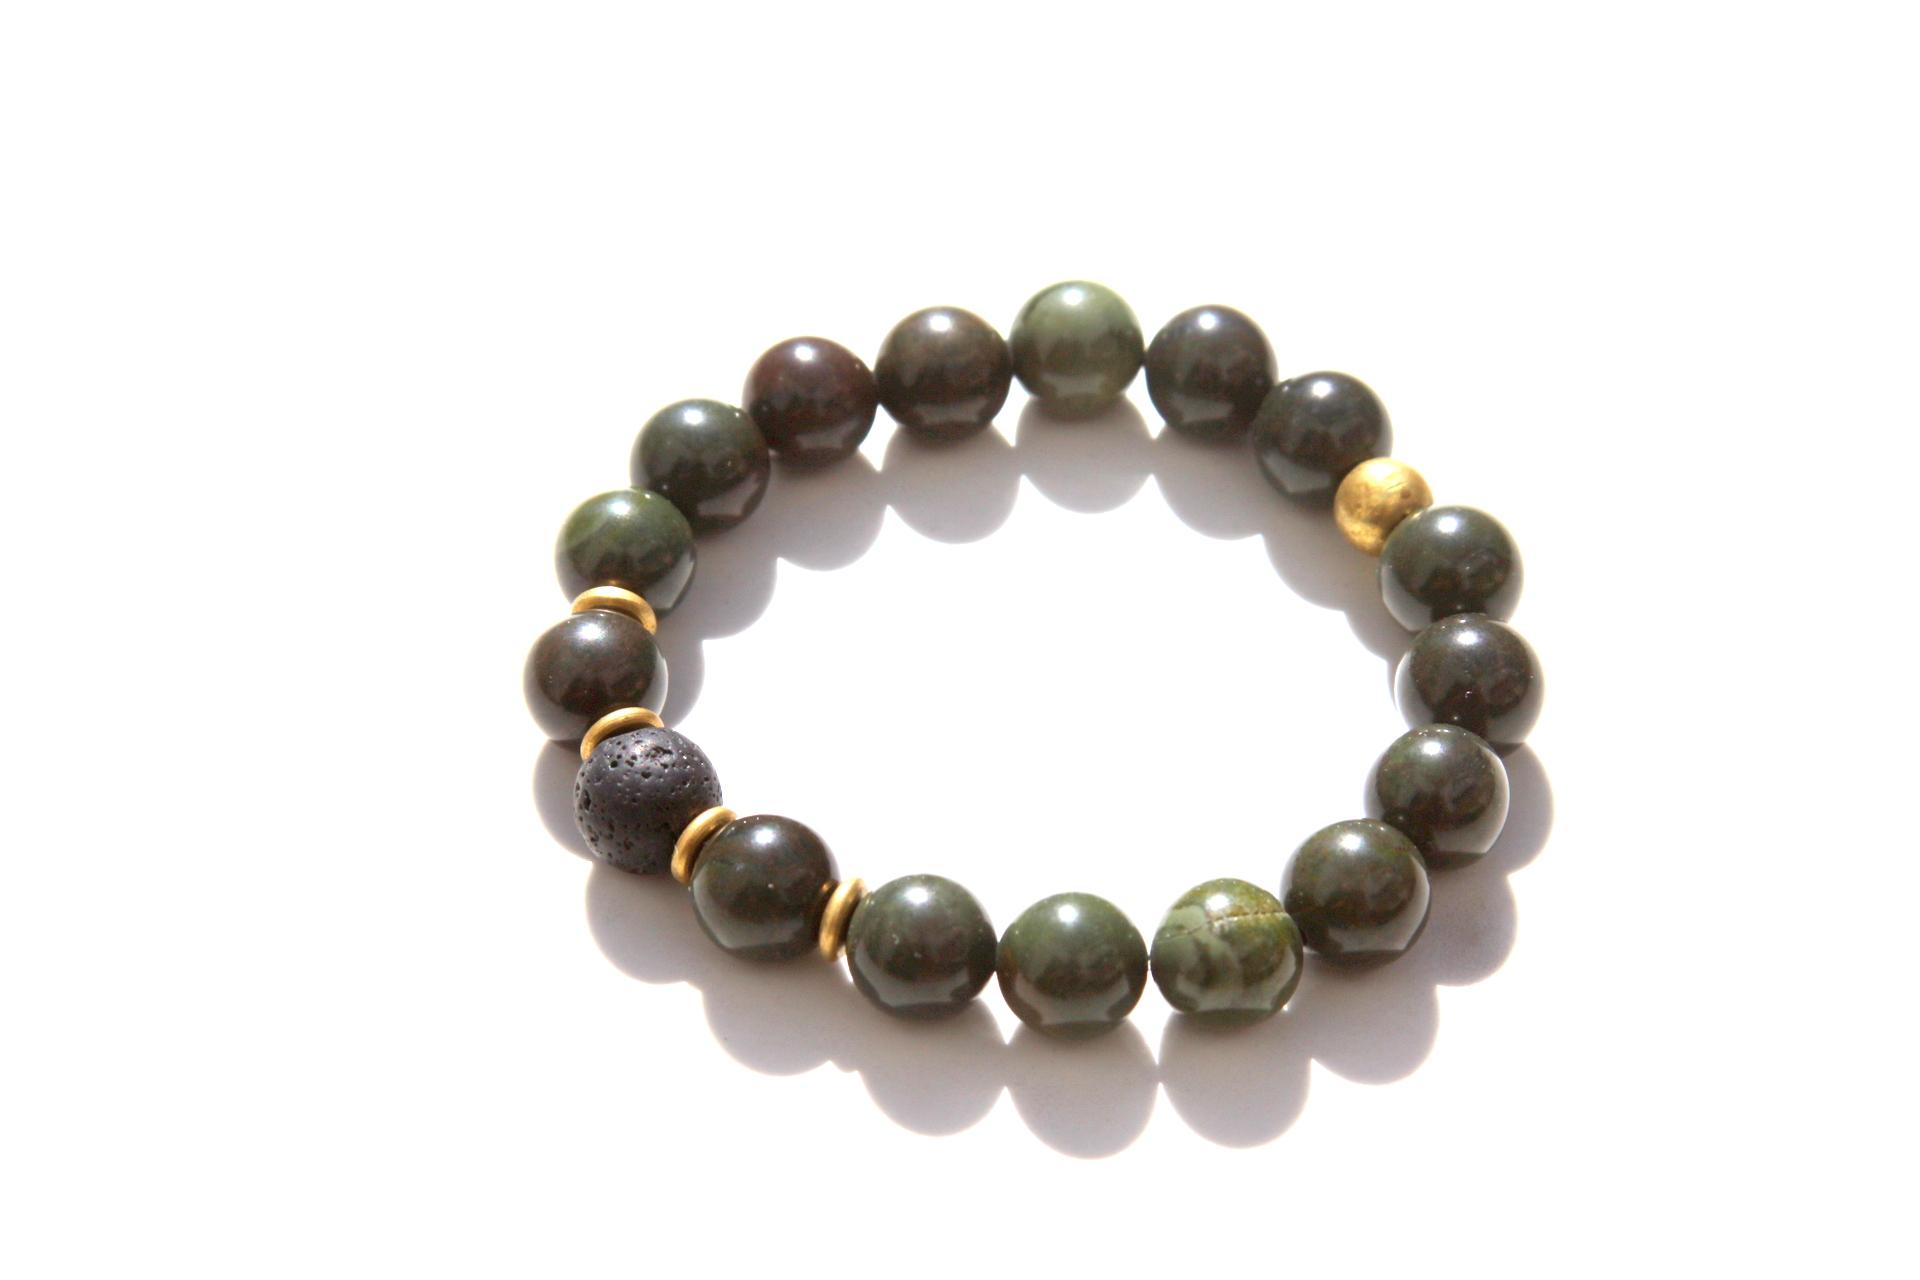 Gemstone Bracelet Green Bracelet Green and Silver Stretch Bracelet Jungle Jasper Modern Bracelet Green Jasper Stone Bracelet Smooth